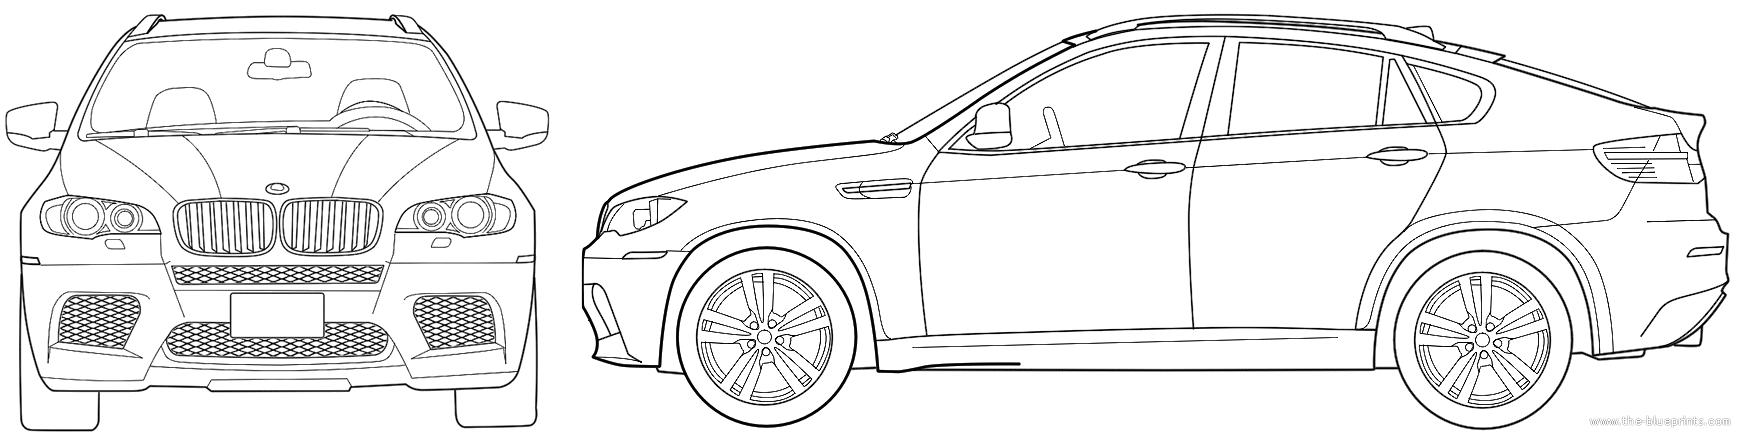 Blueprints Cars Bmw Bmw X6 M E72